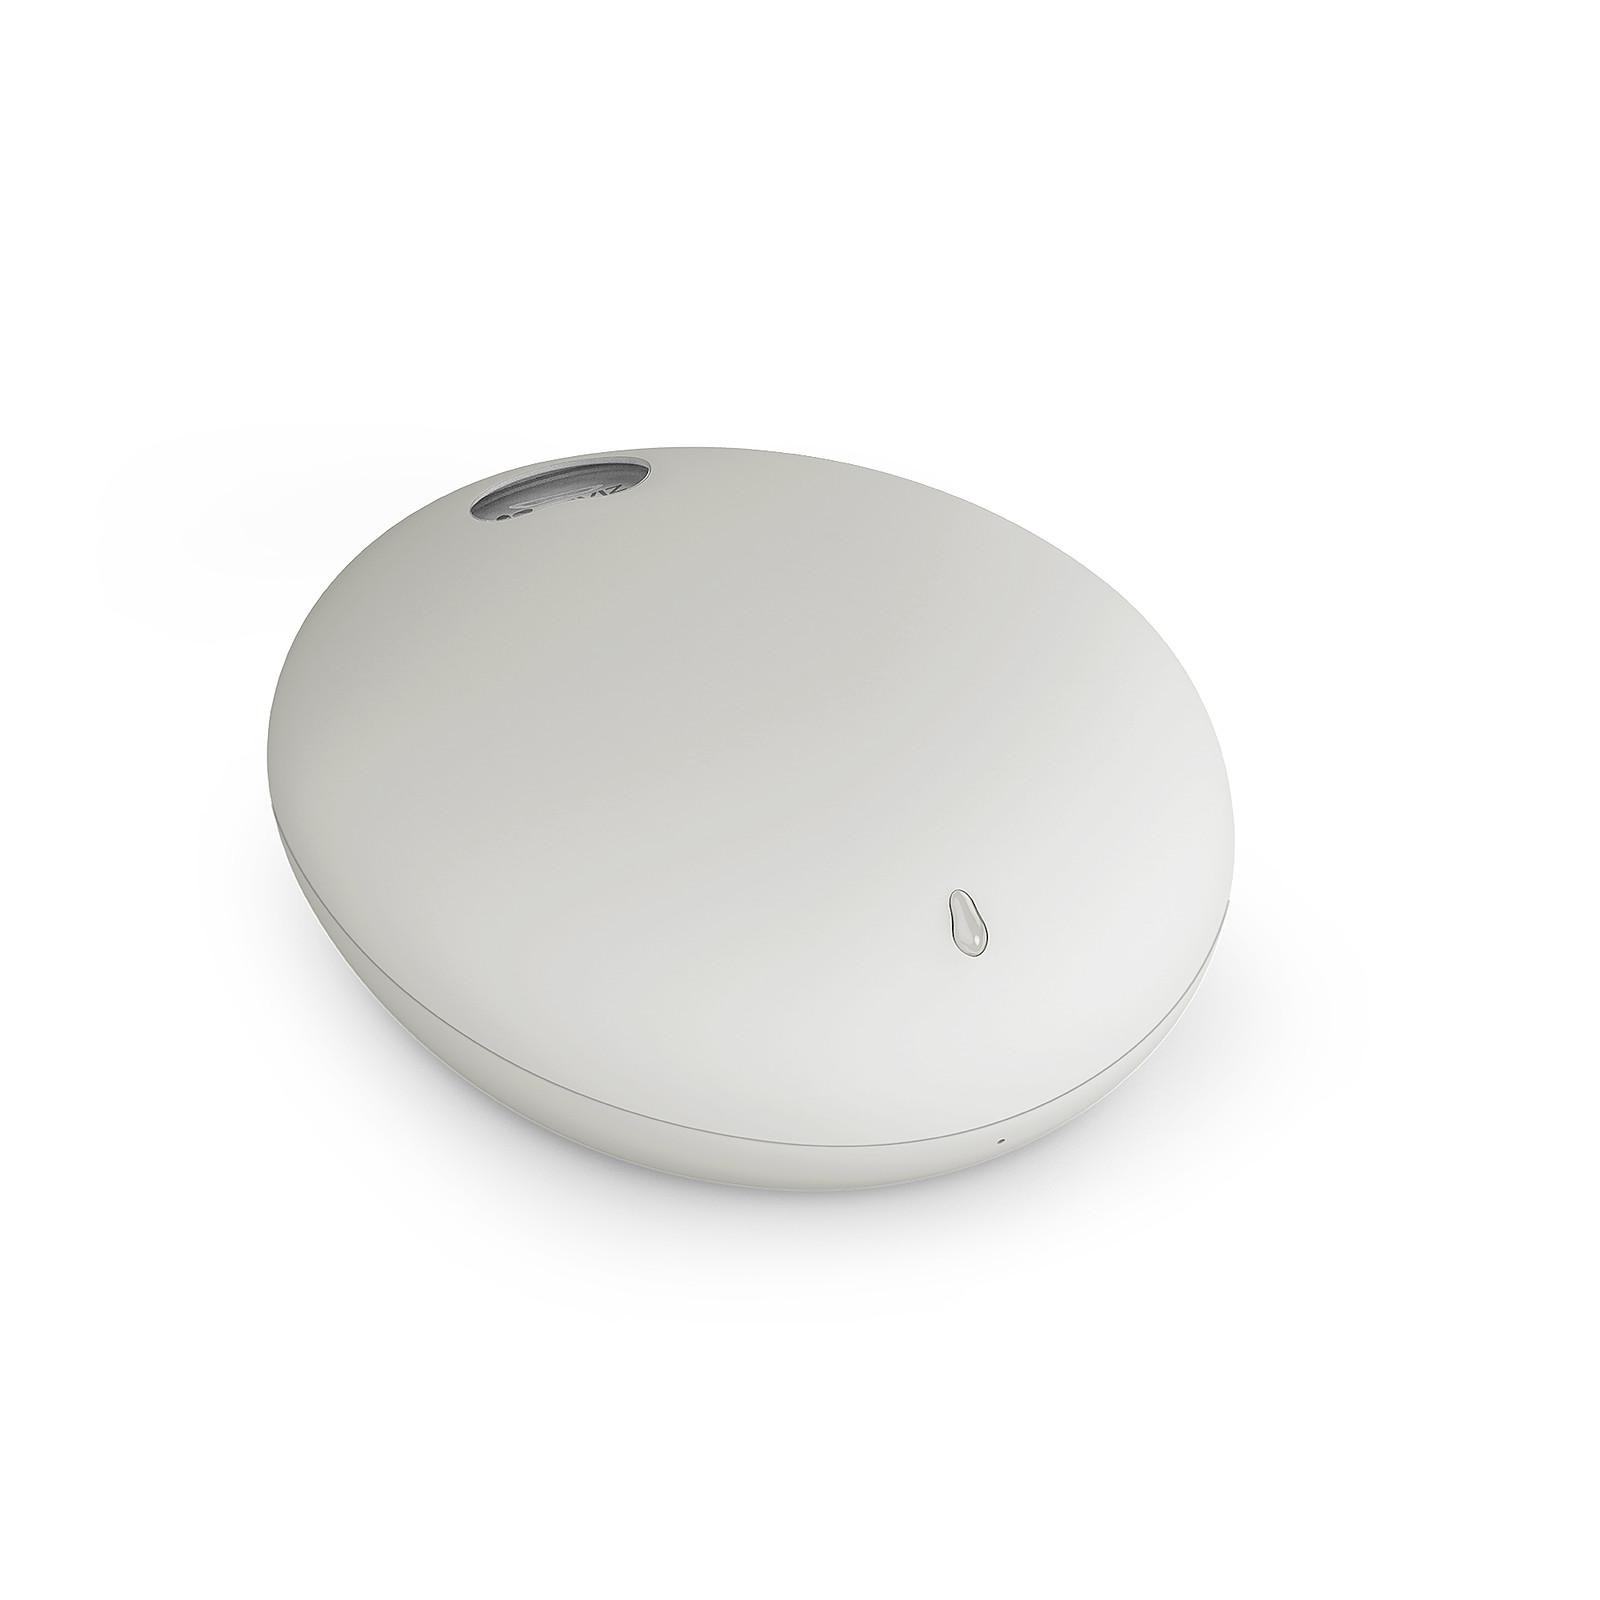 Ezviz Centrale d'alarme IP - A1S Ethernet / wi-fi / 2G -